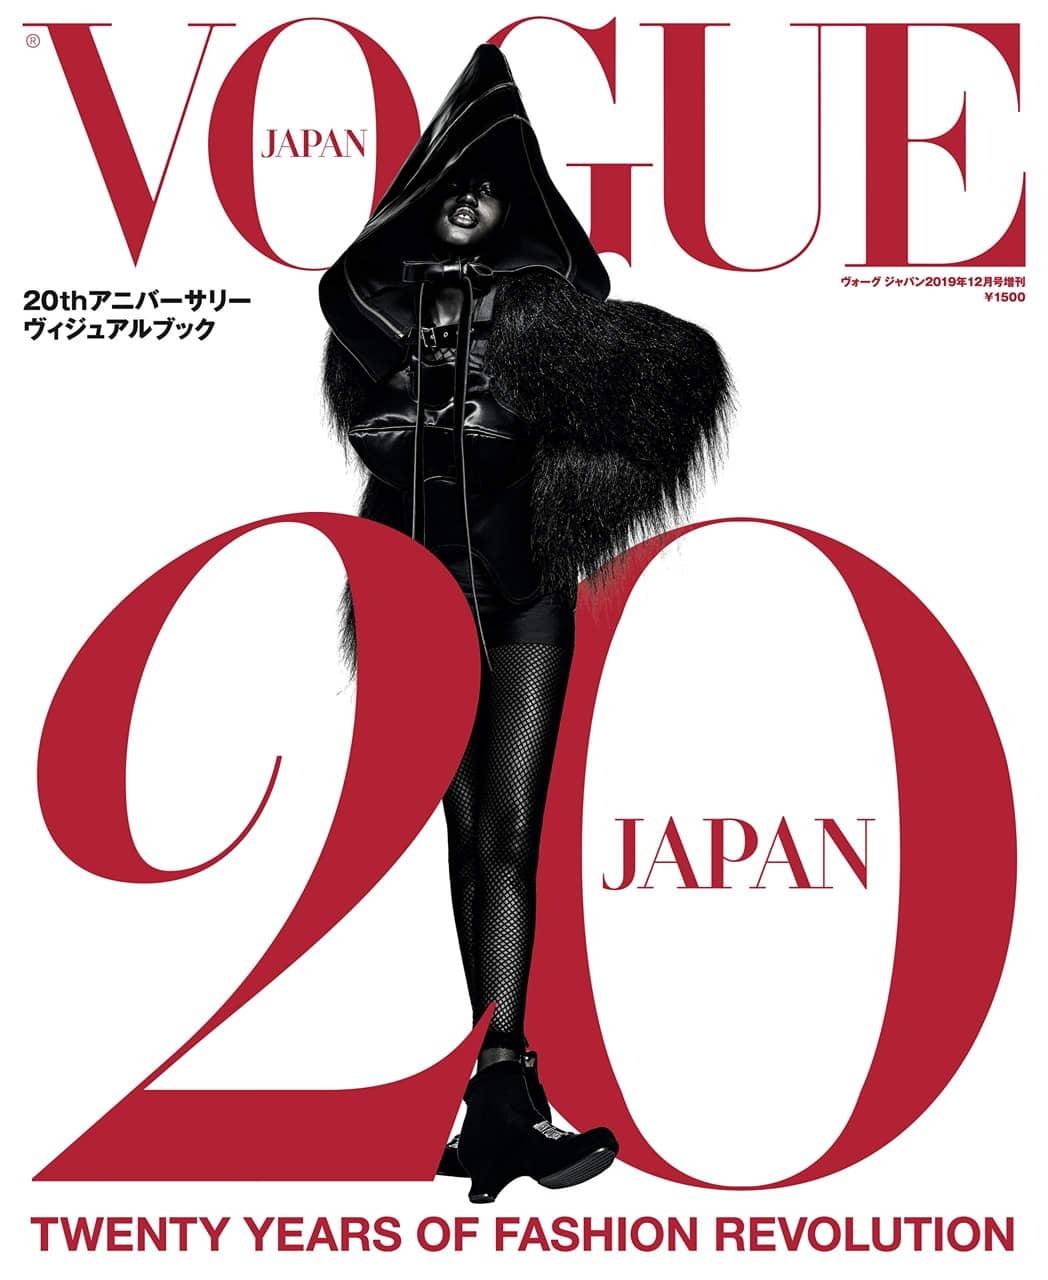 VOGUE JAPAN 20thアニバーサリー ヴィジュアルブック